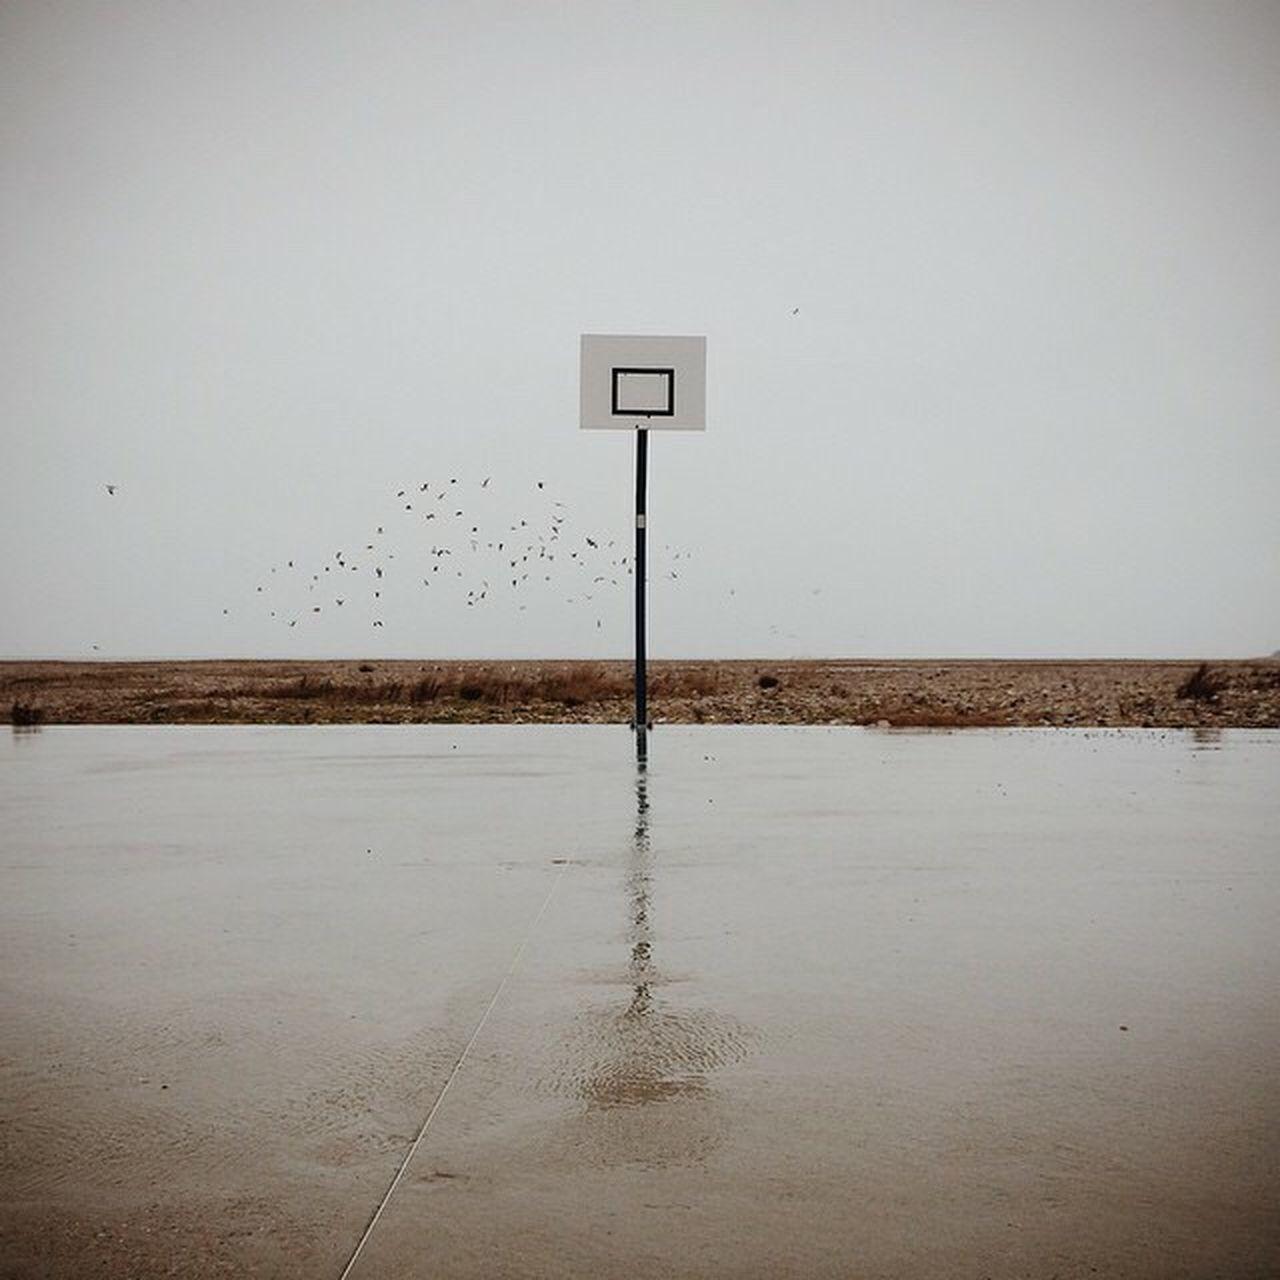 Lonely Loneliness Basket Basketball Play Playing Playground France Minimalism Minimal No People Minimalobsession Foggy Havre